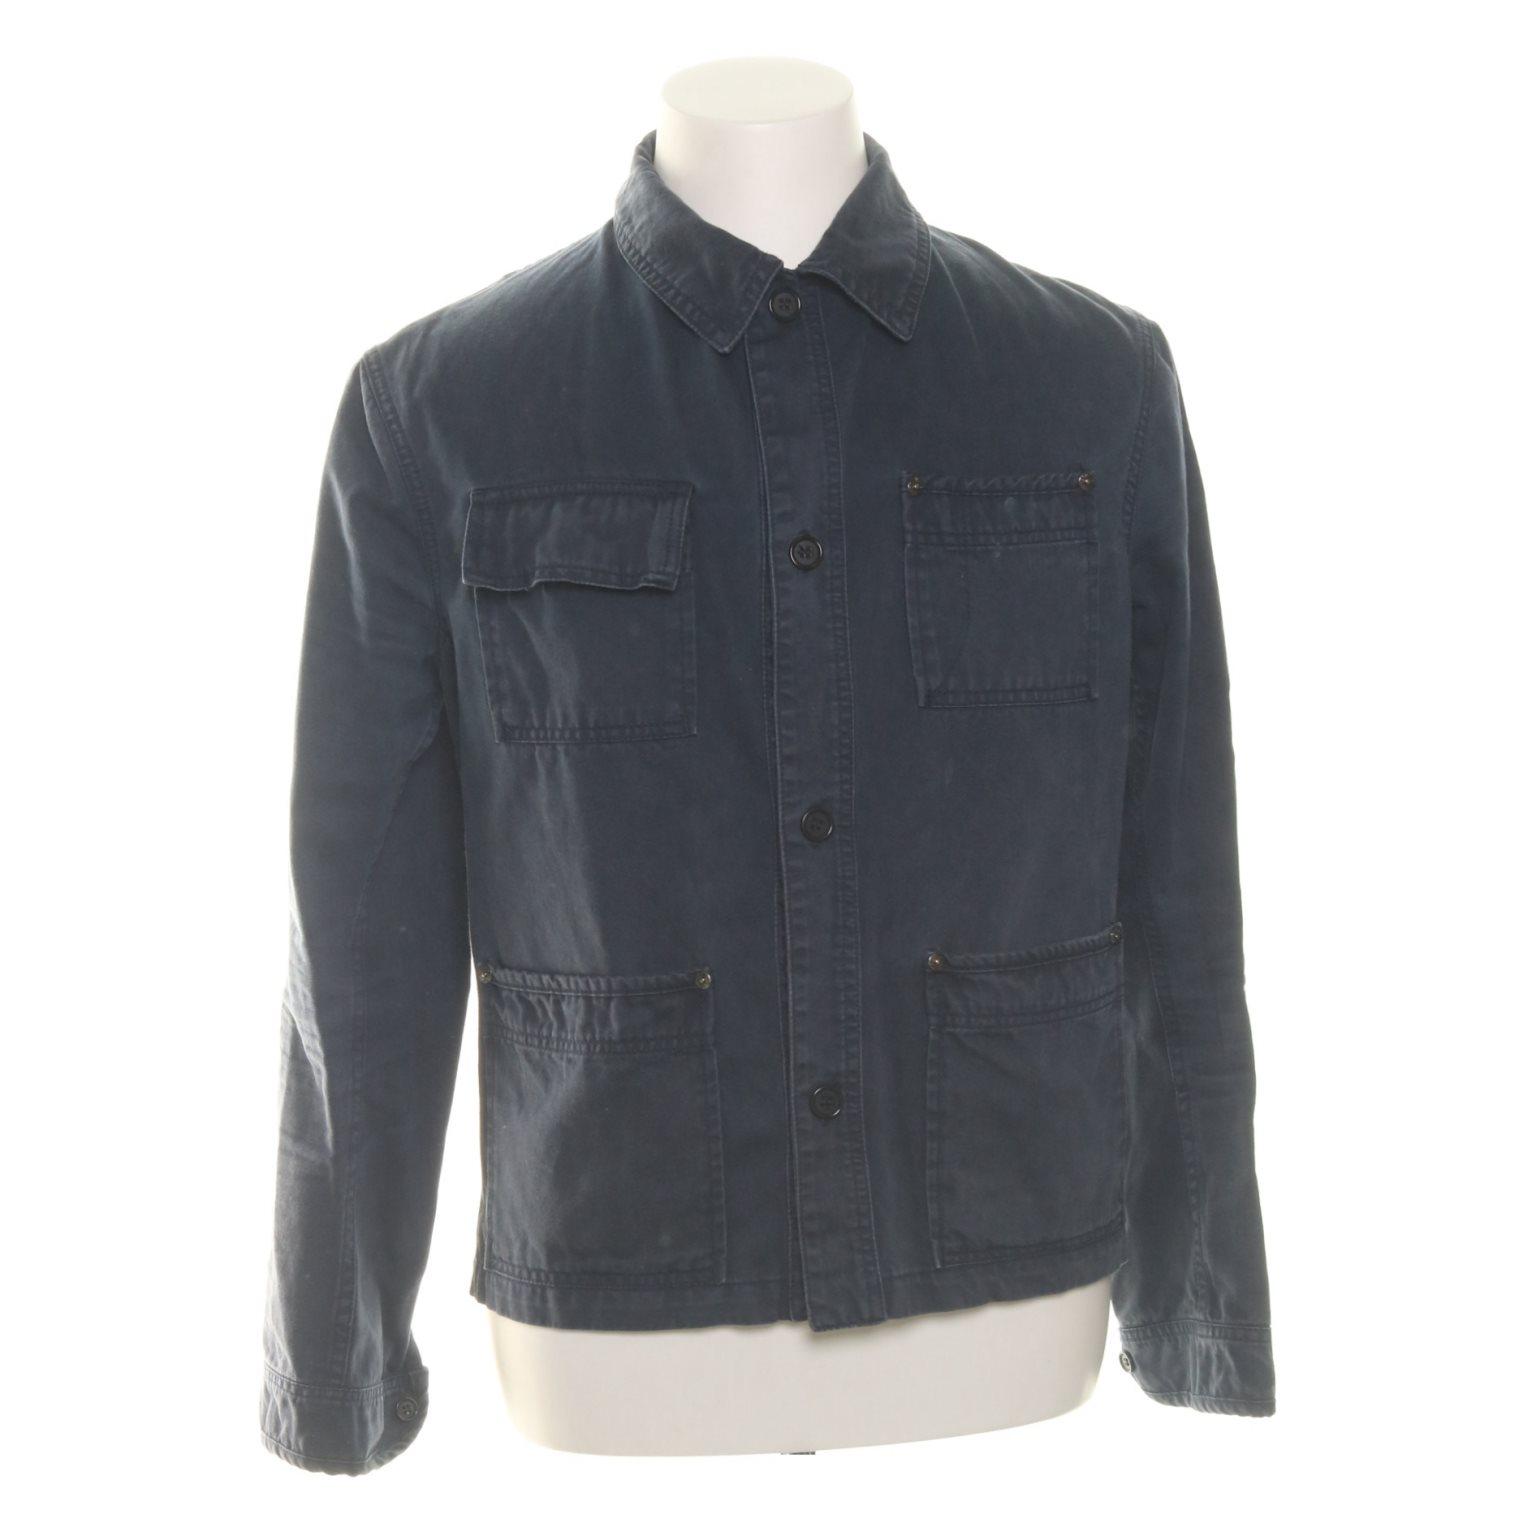 Acne Jeans, Skjorta, Strl: 50, Mörkblå